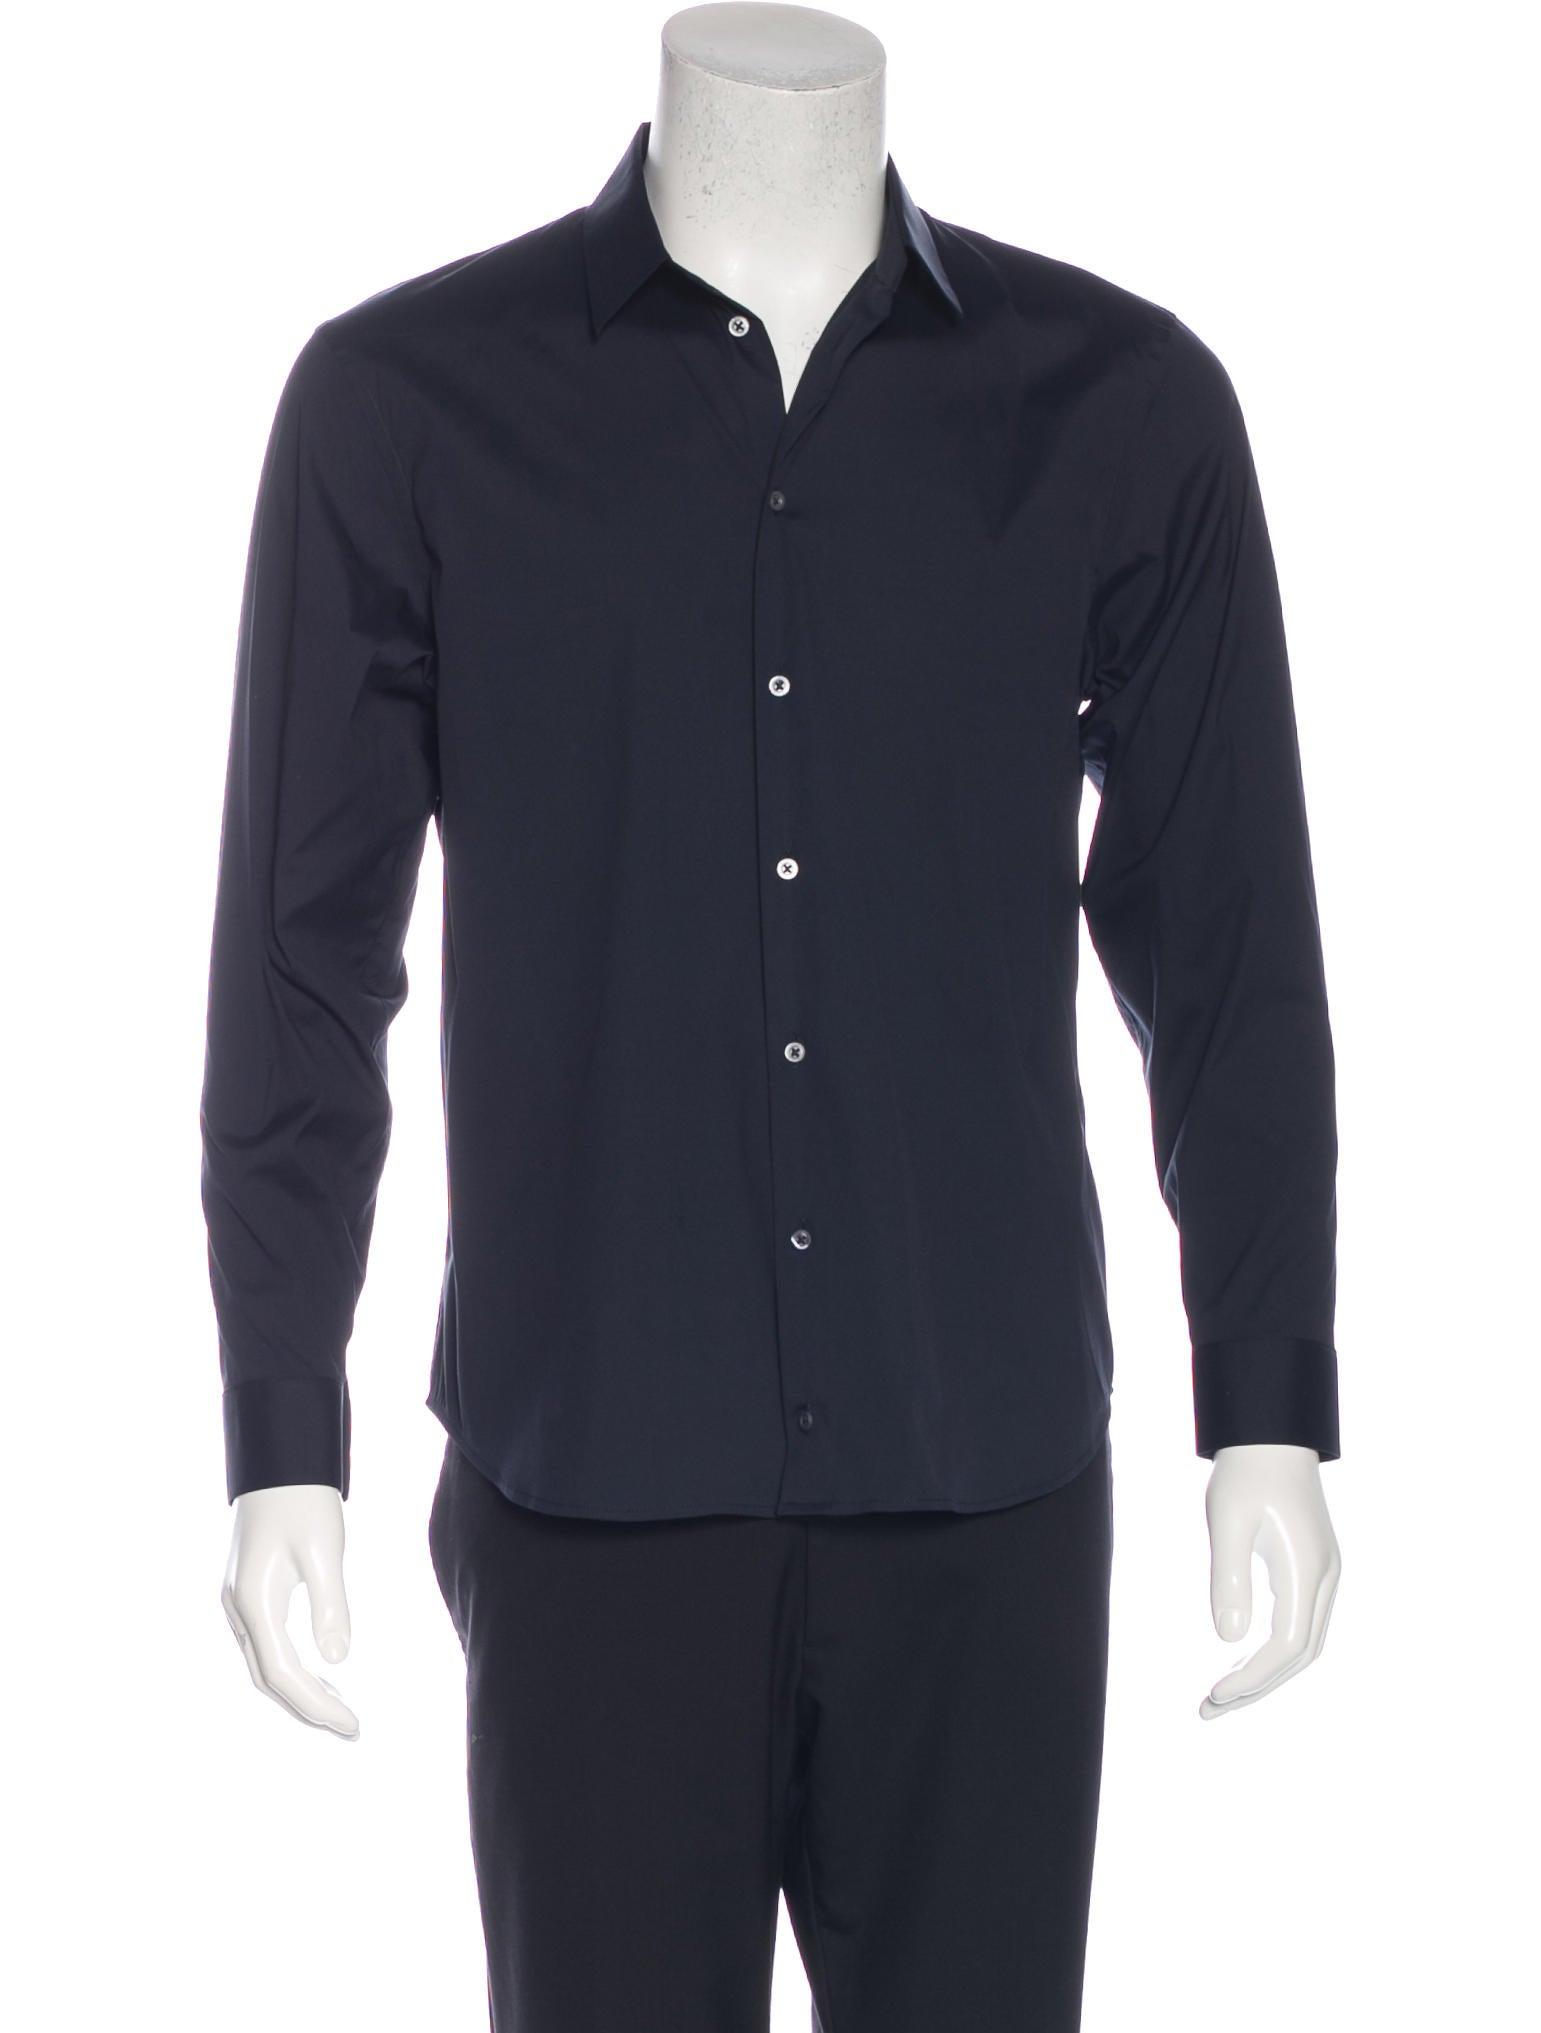 Jil sander woven dress shirt clothing jil37877 the for Jil sander mens shirt